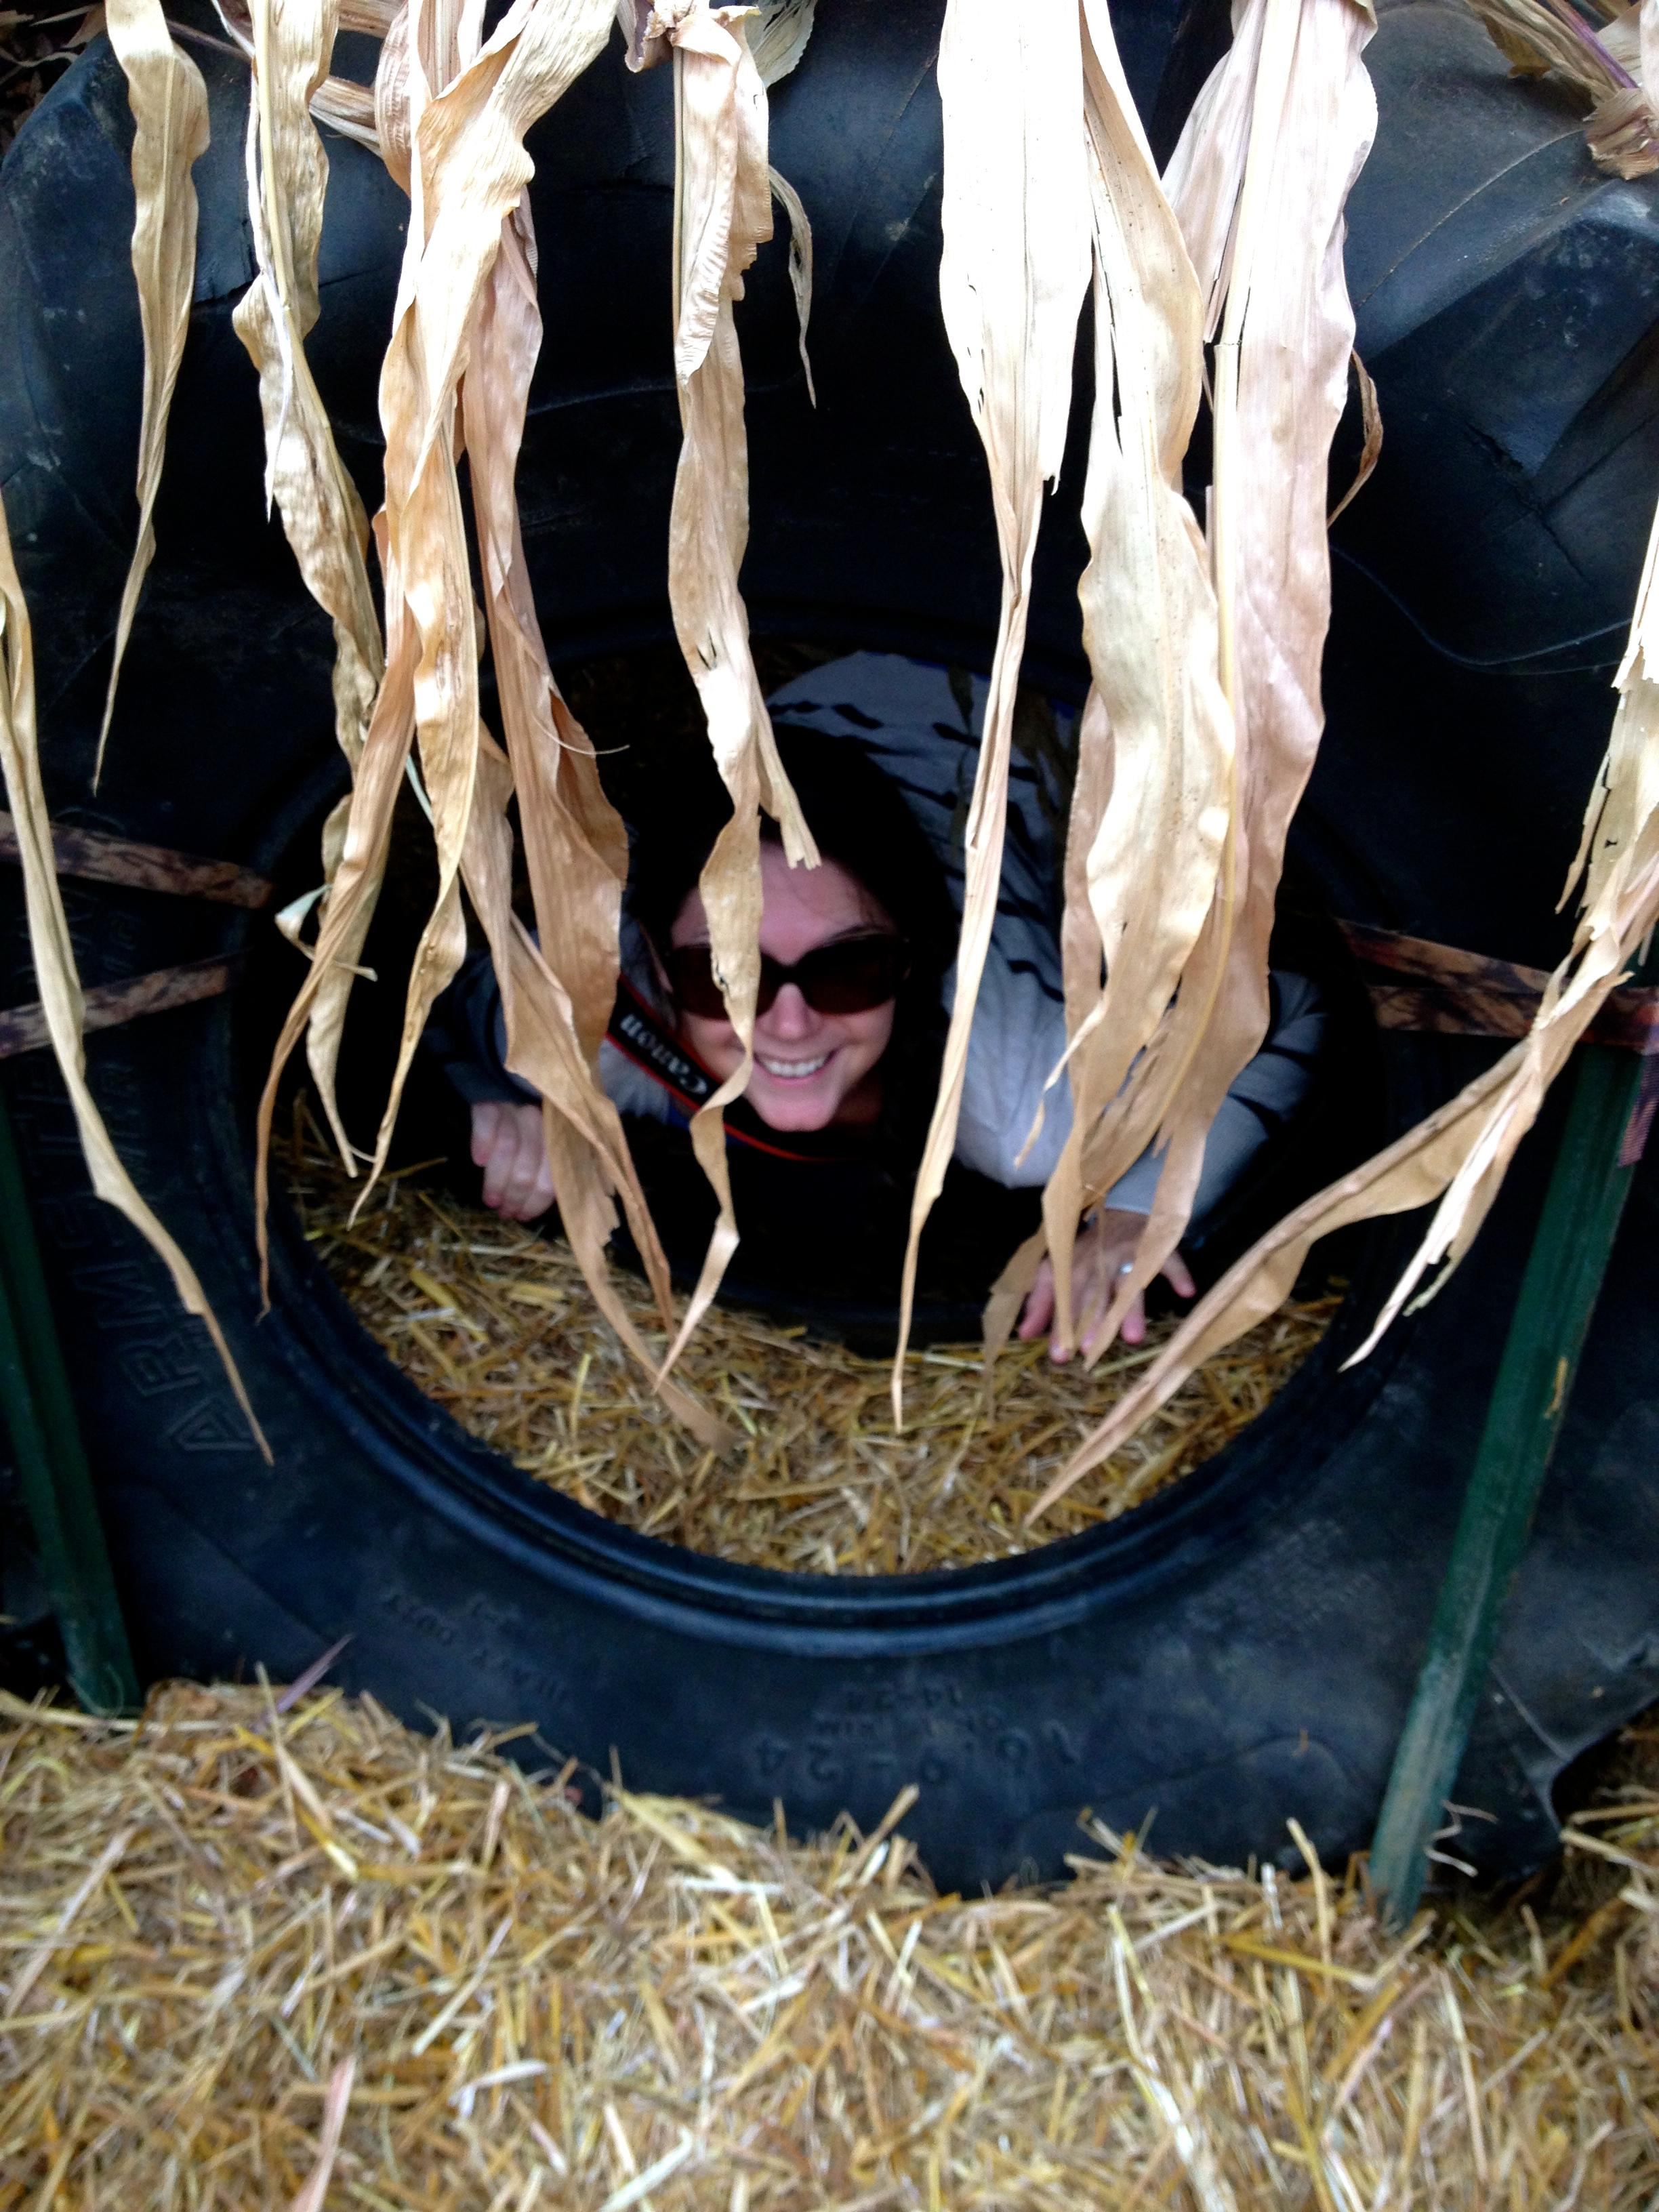 Hiding in the maze